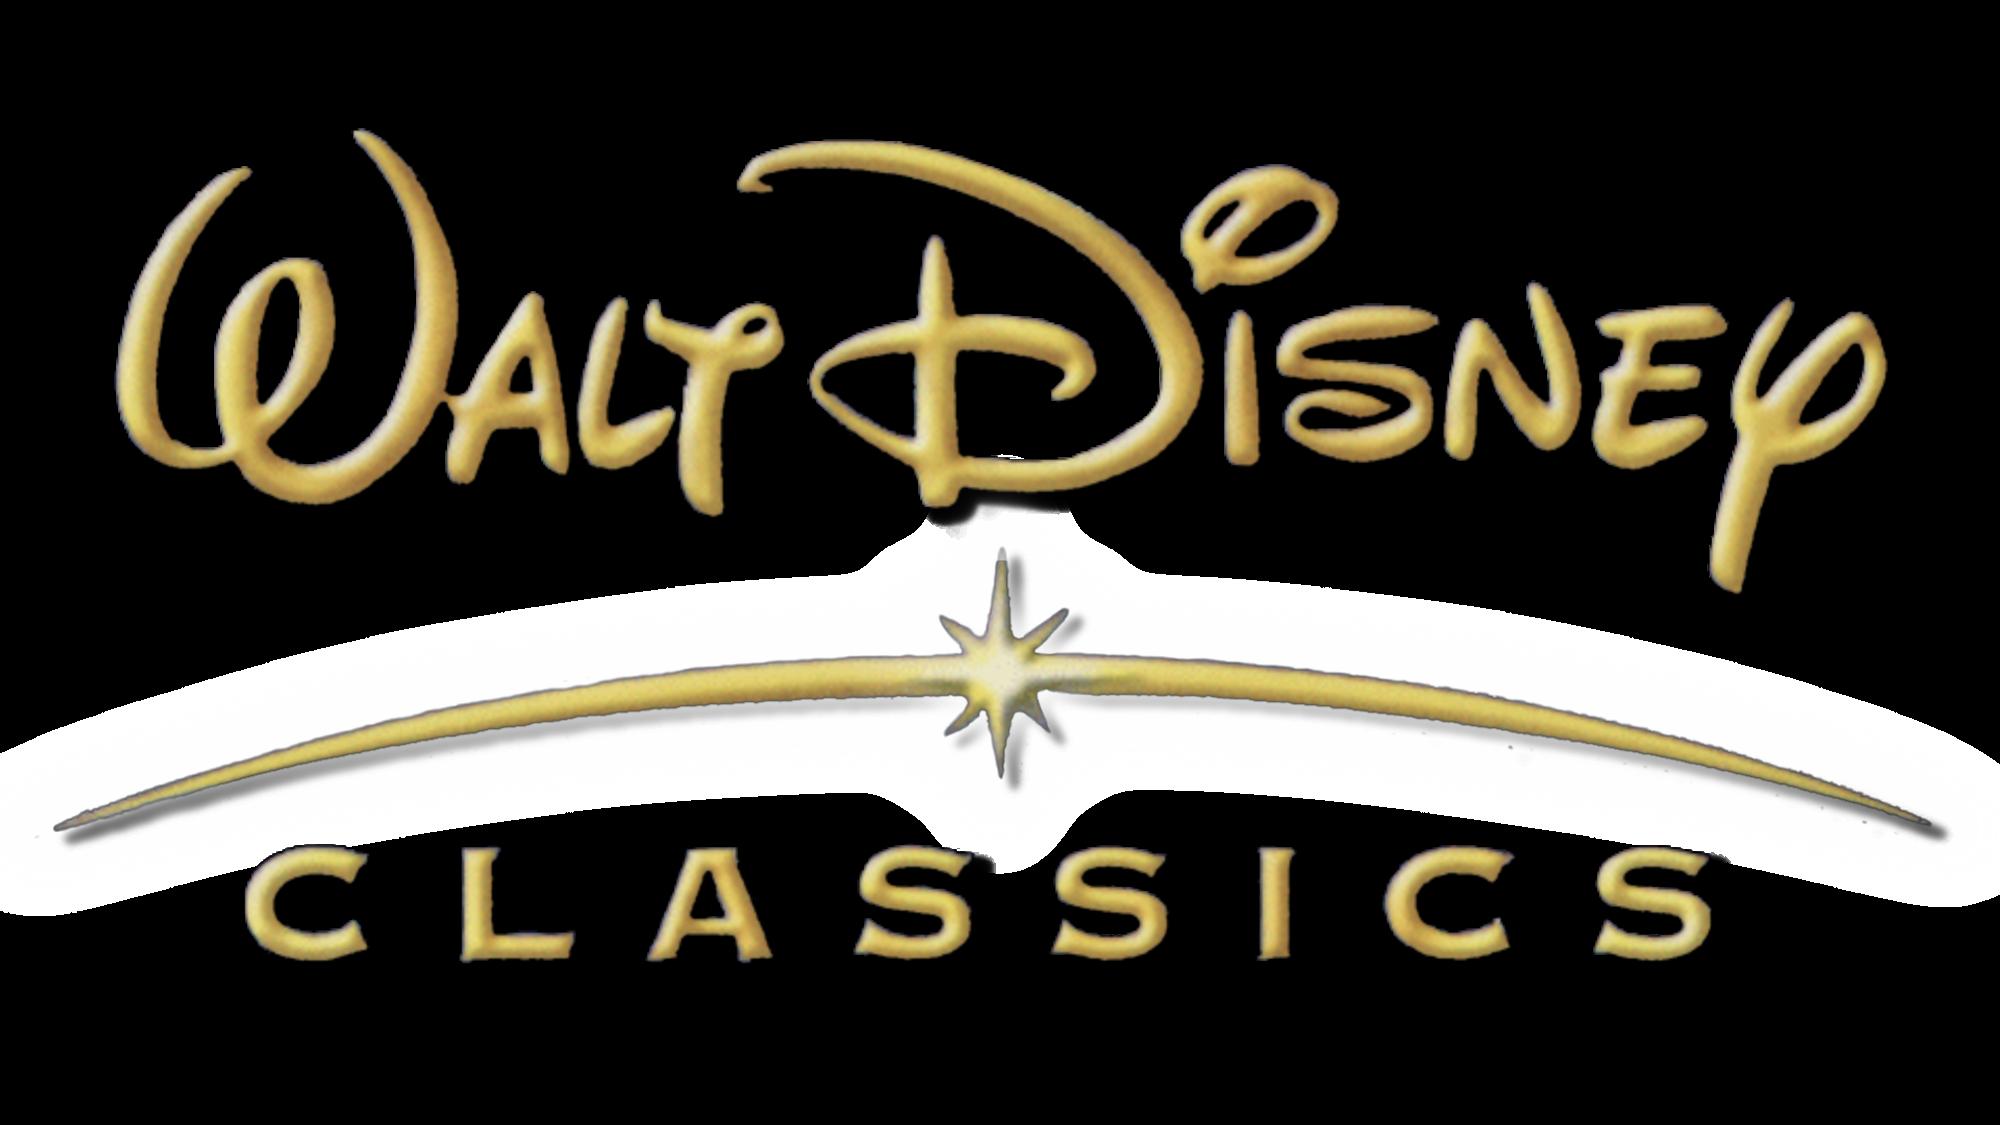 Image walt disney classics 2001 2008 disney for Classic house songs 2000